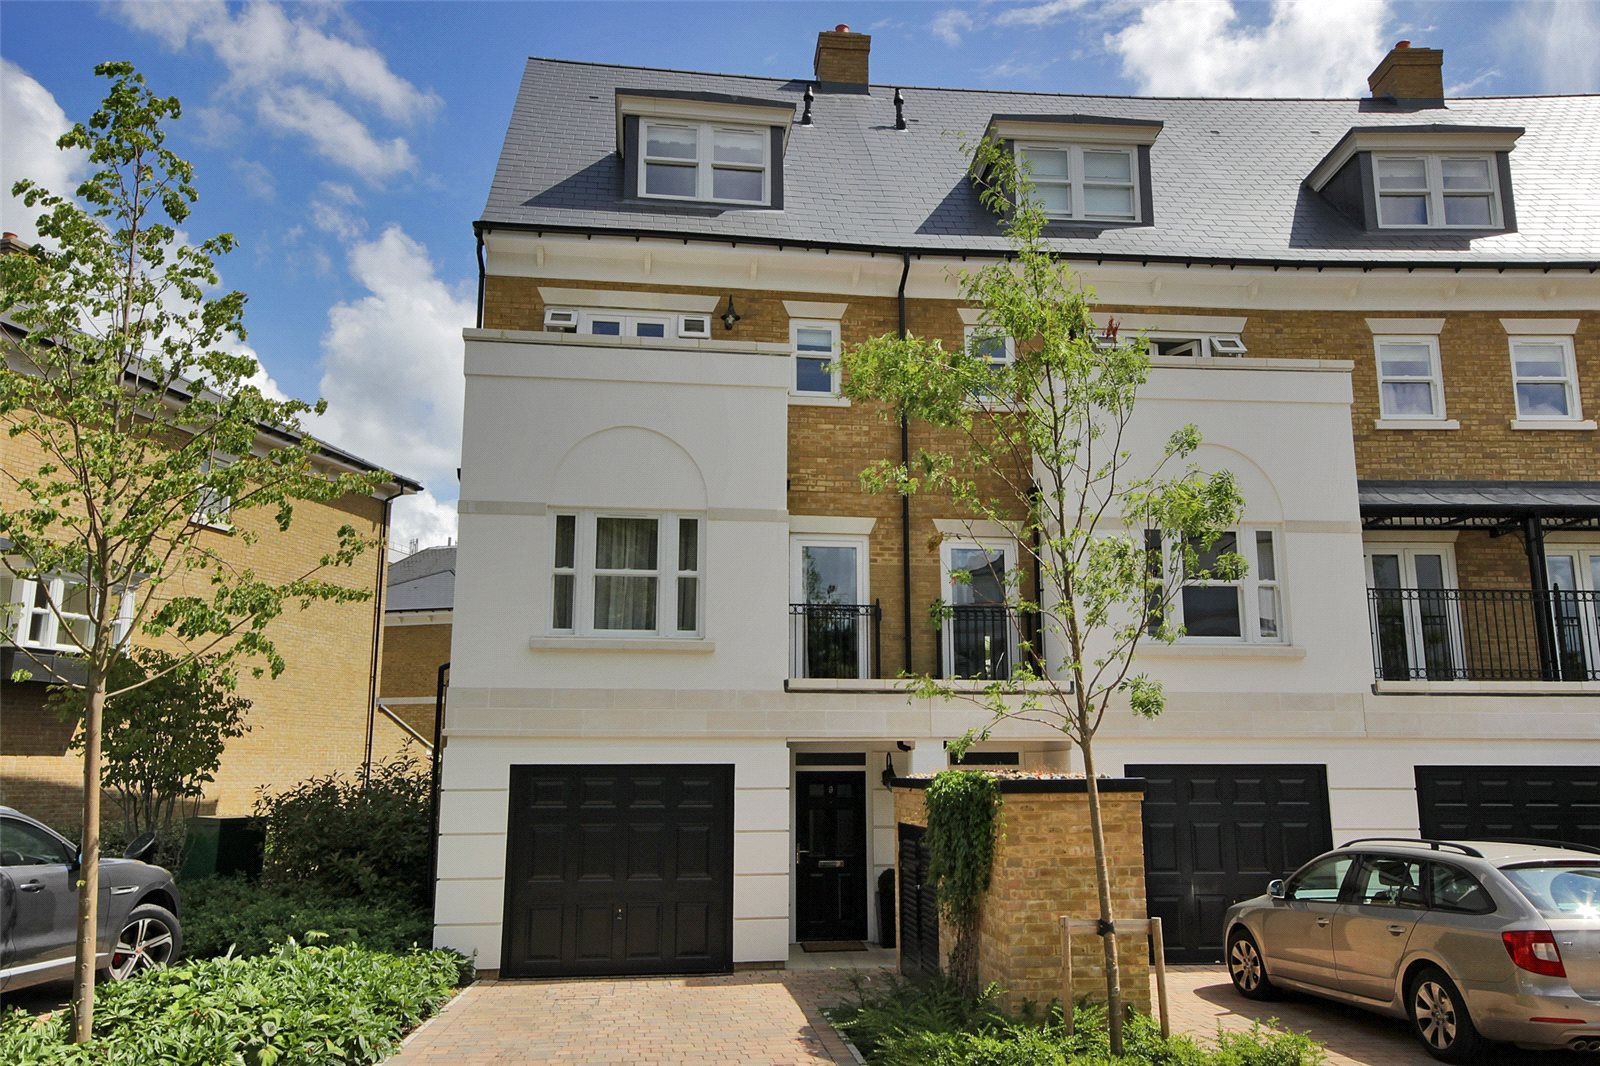 Частный дом для того Продажа на Huntingdon Avenue, Tunbridge Wells, Kent, TN4 Tunbridge Wells, Англия